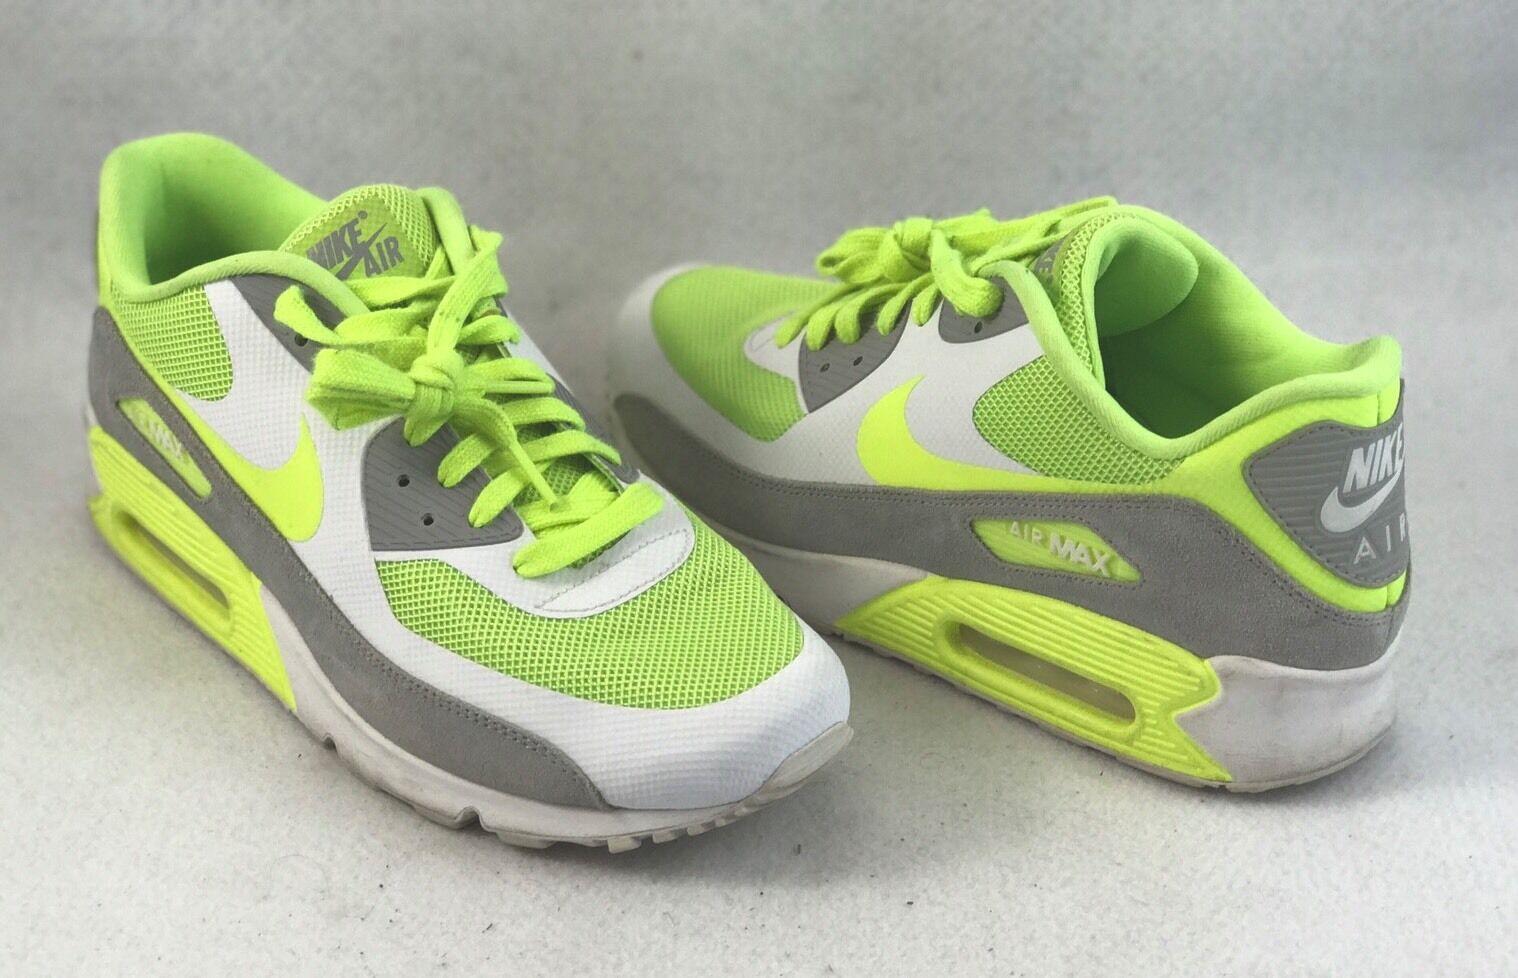 Nike air max 90 premio campione volt lupo grigio / bianco / verde Uomo sz 9 - 1092